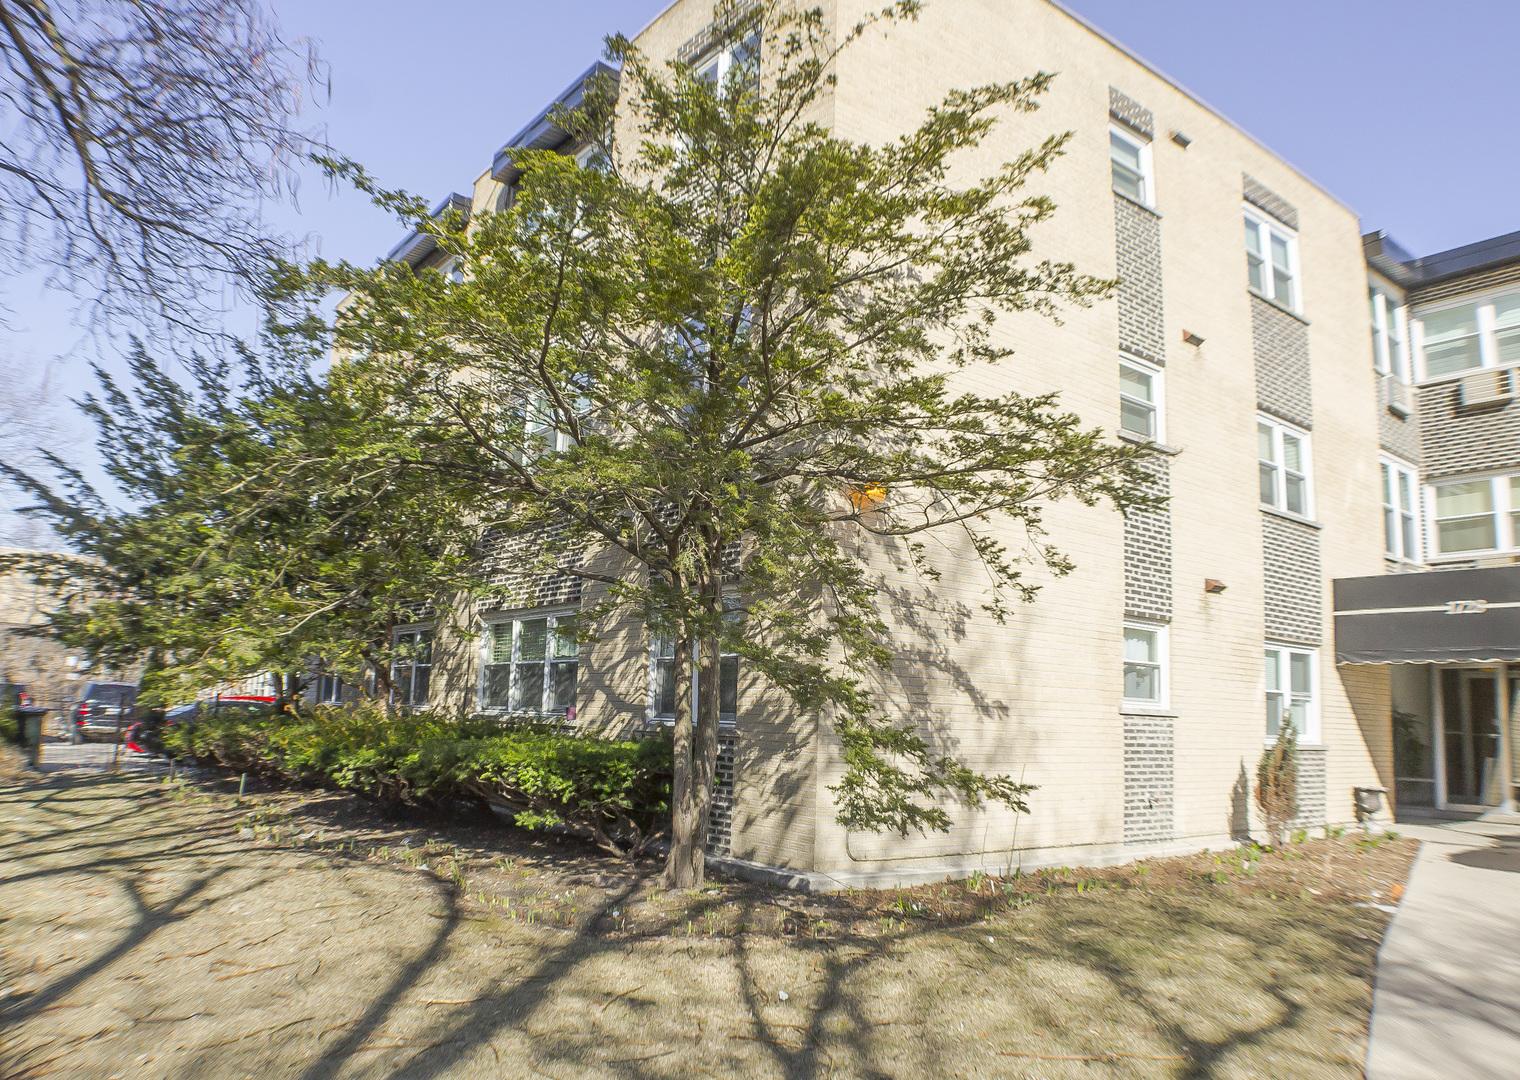 1728 West Farwell 108, CHICAGO, Illinois, 60626